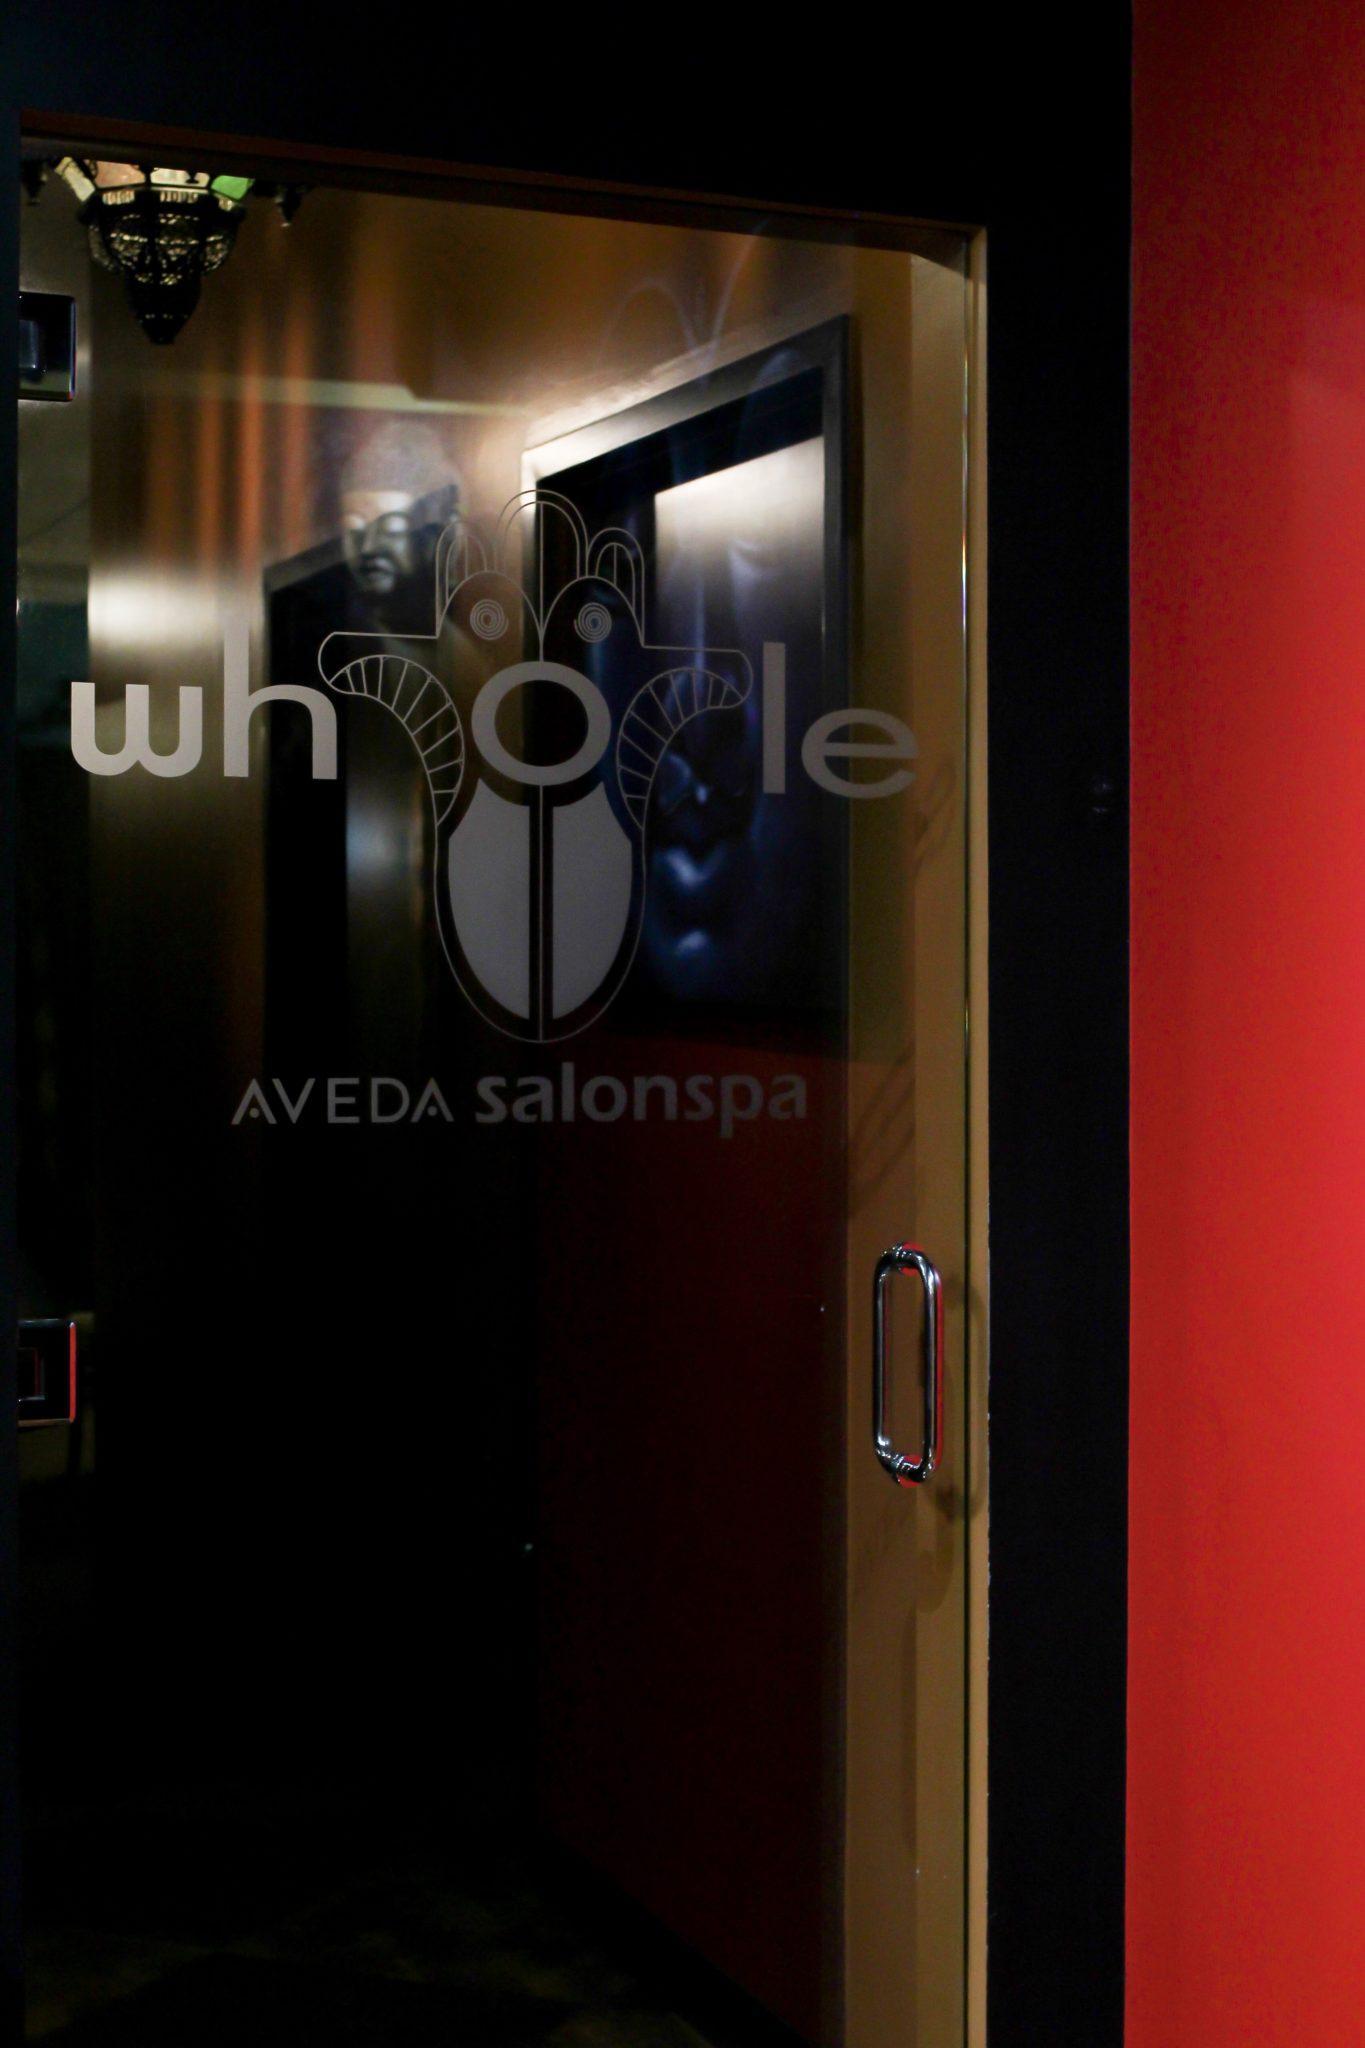 WHOLE AVEDA SALON AND SPA | OLDSMAR FLORIDA